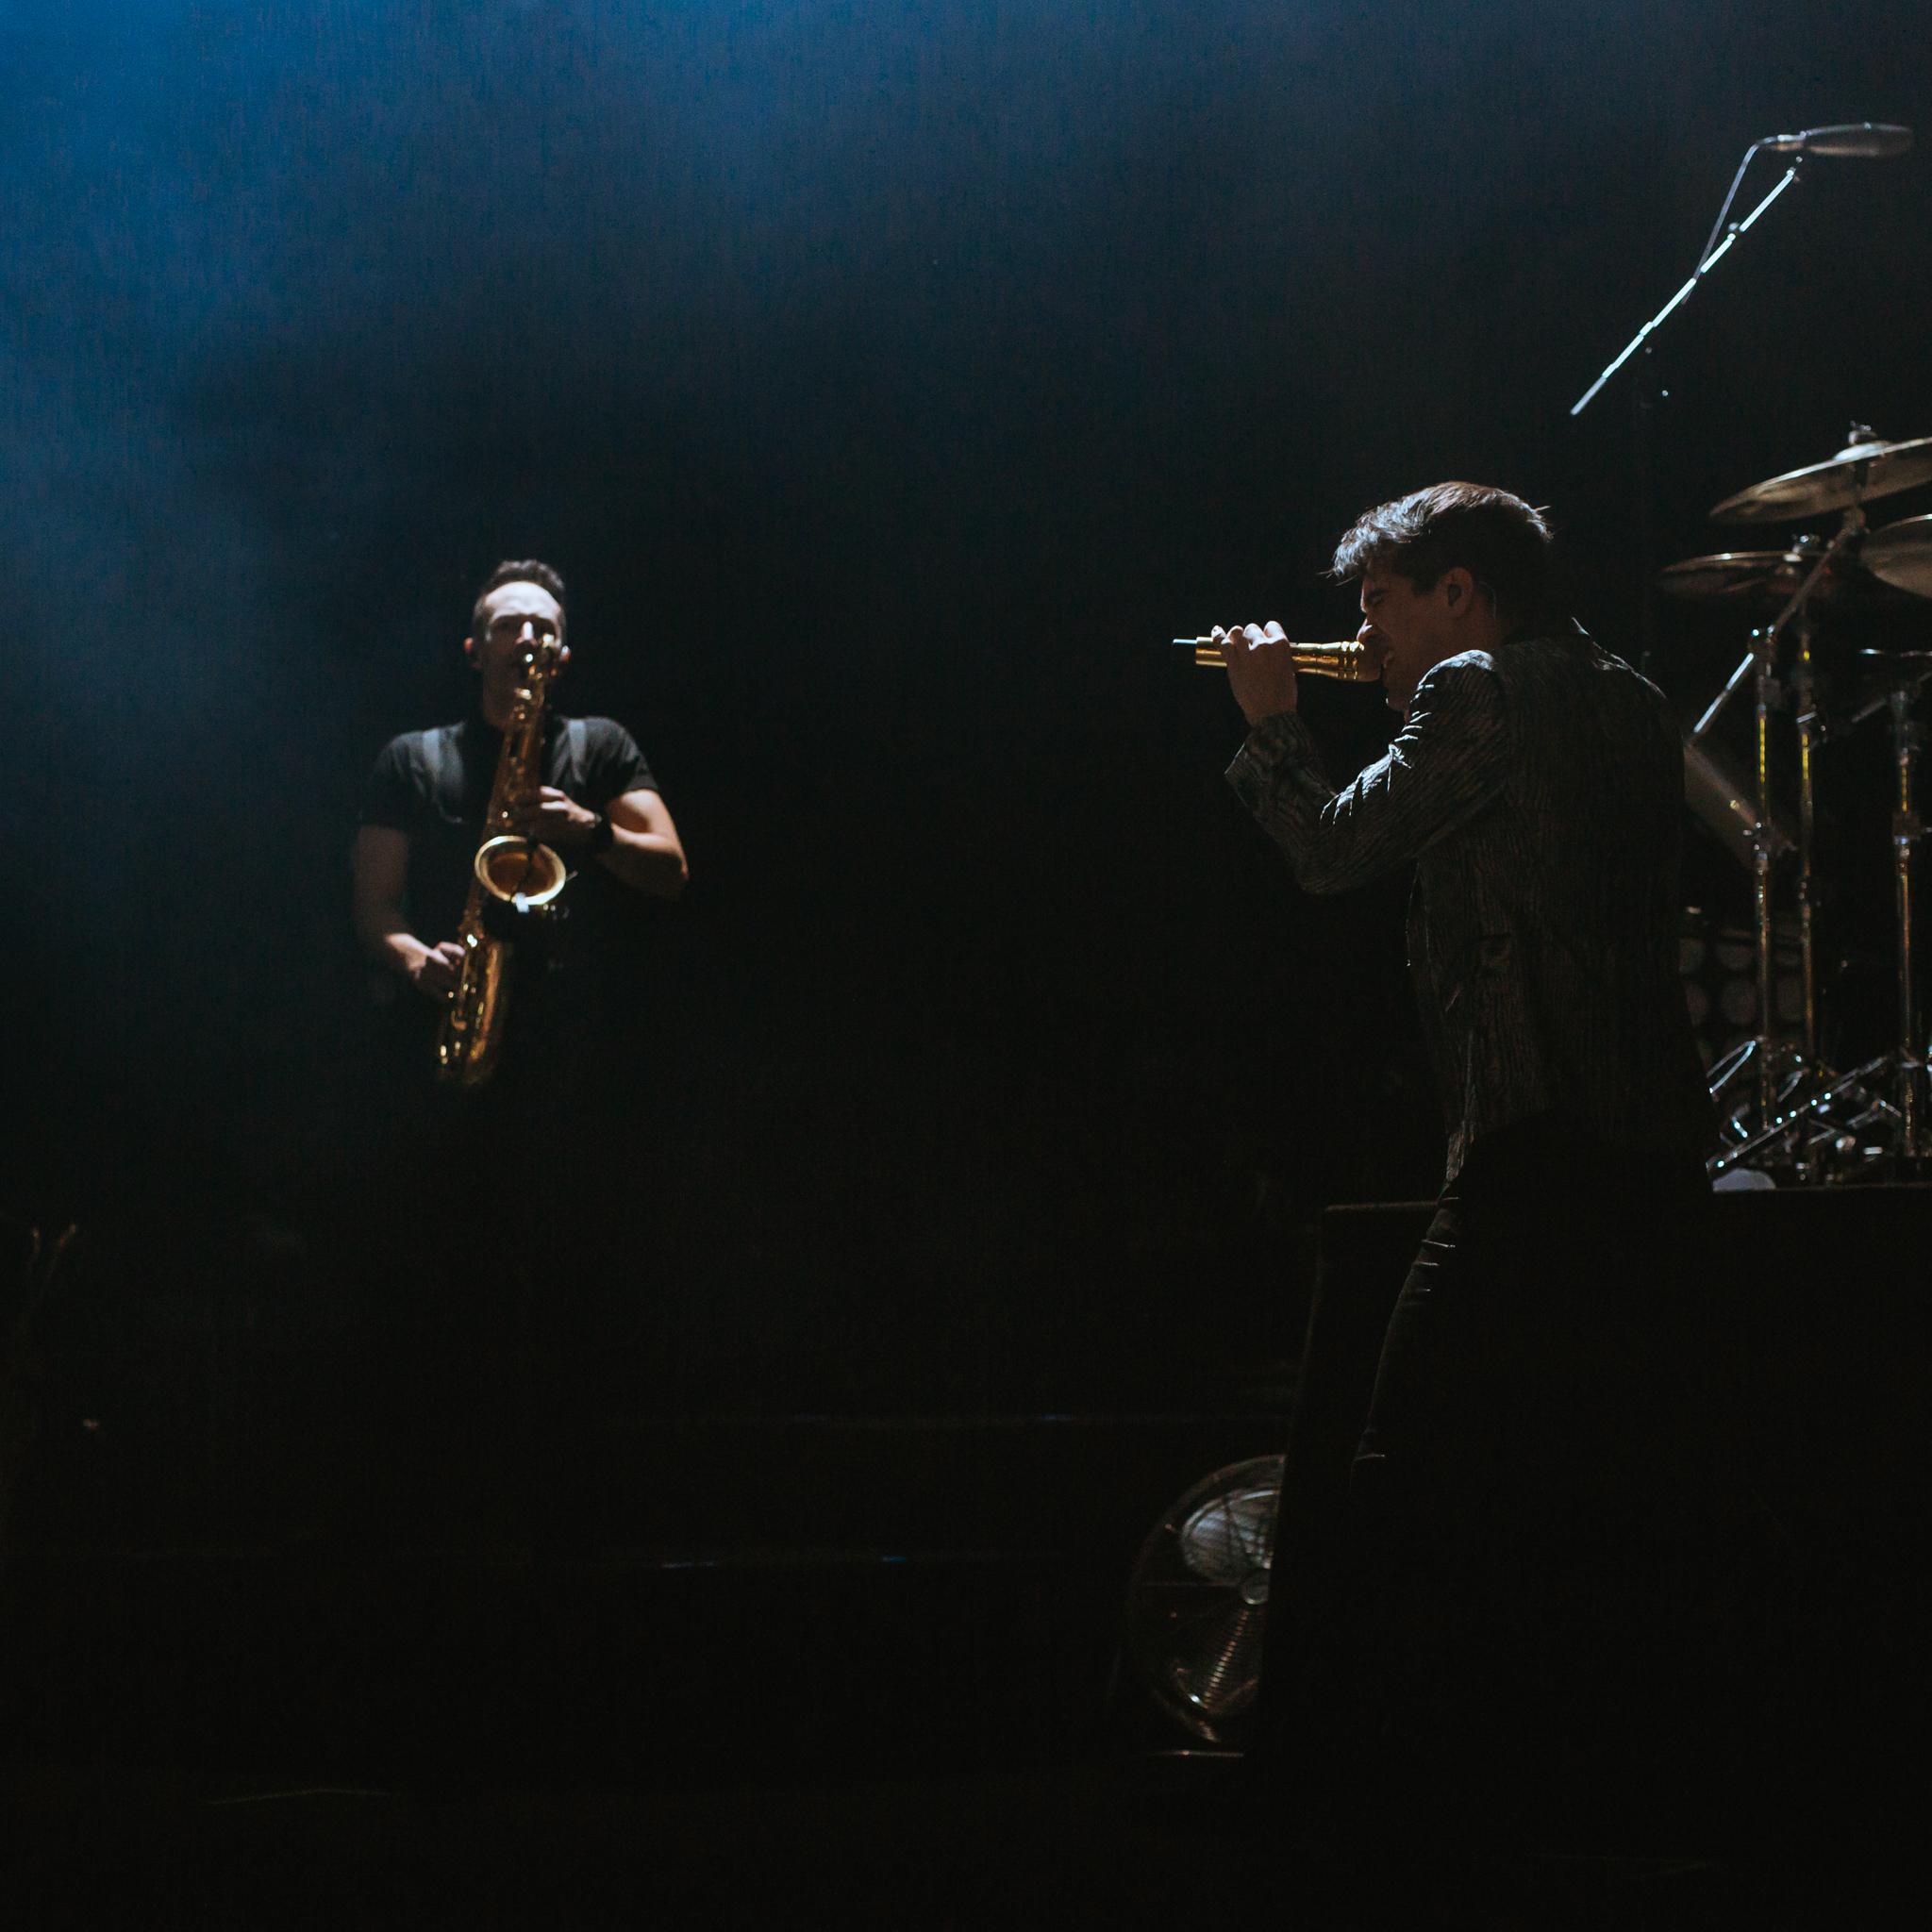 Mitch Lowe Photo - Panic At The Disco - Riverstage-10.jpg